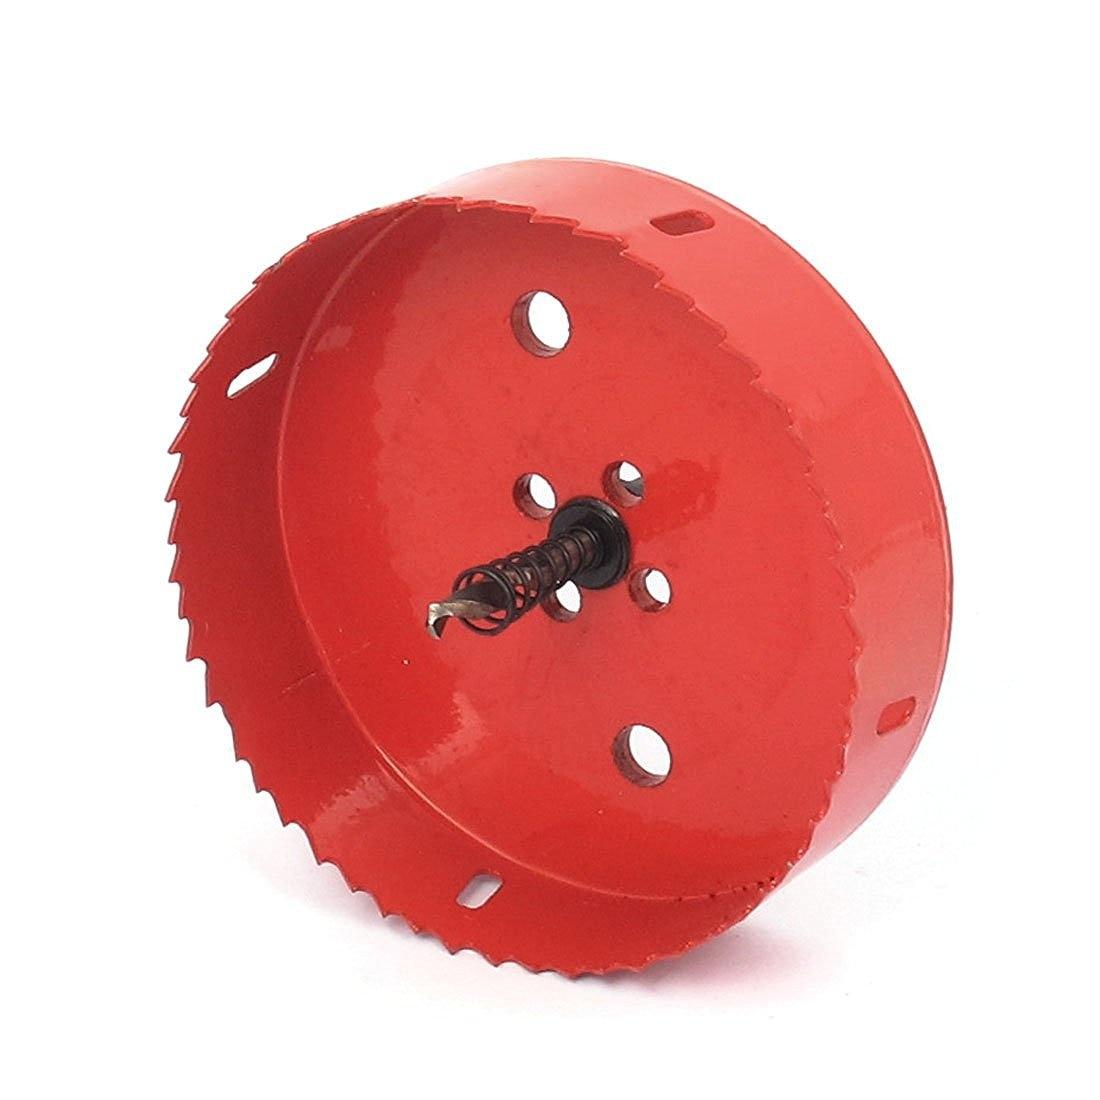 6mm Drill Bit 130mm Cutting Diameter Hole Saw Red for Drilling Wood 6mm drill bit 145mm cutting diameter